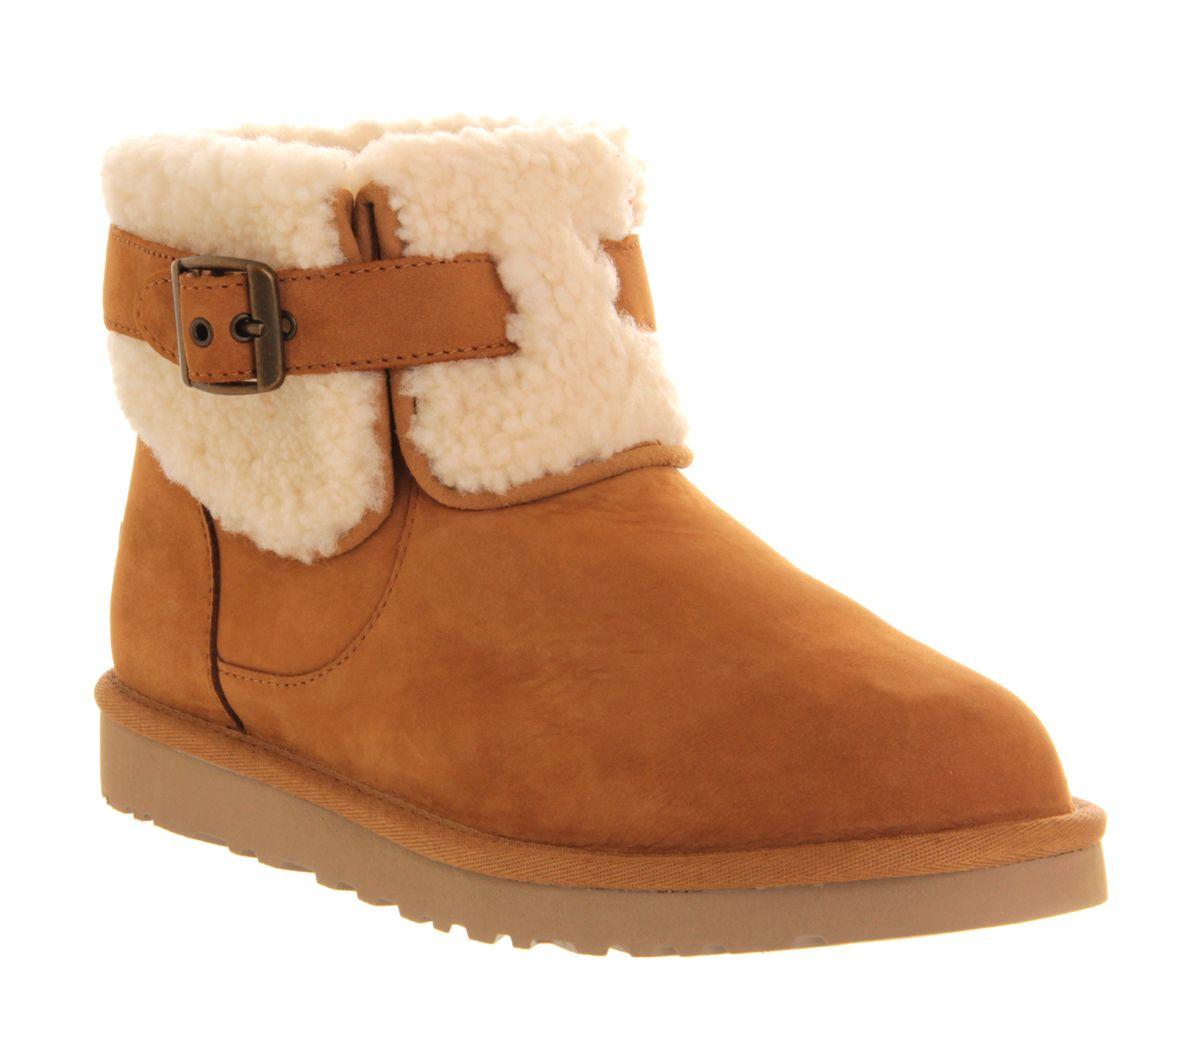 3890f79bc4e UGG Australia Jocelin Shearling Buckle Boot Chestnut - Ankle Boots ...